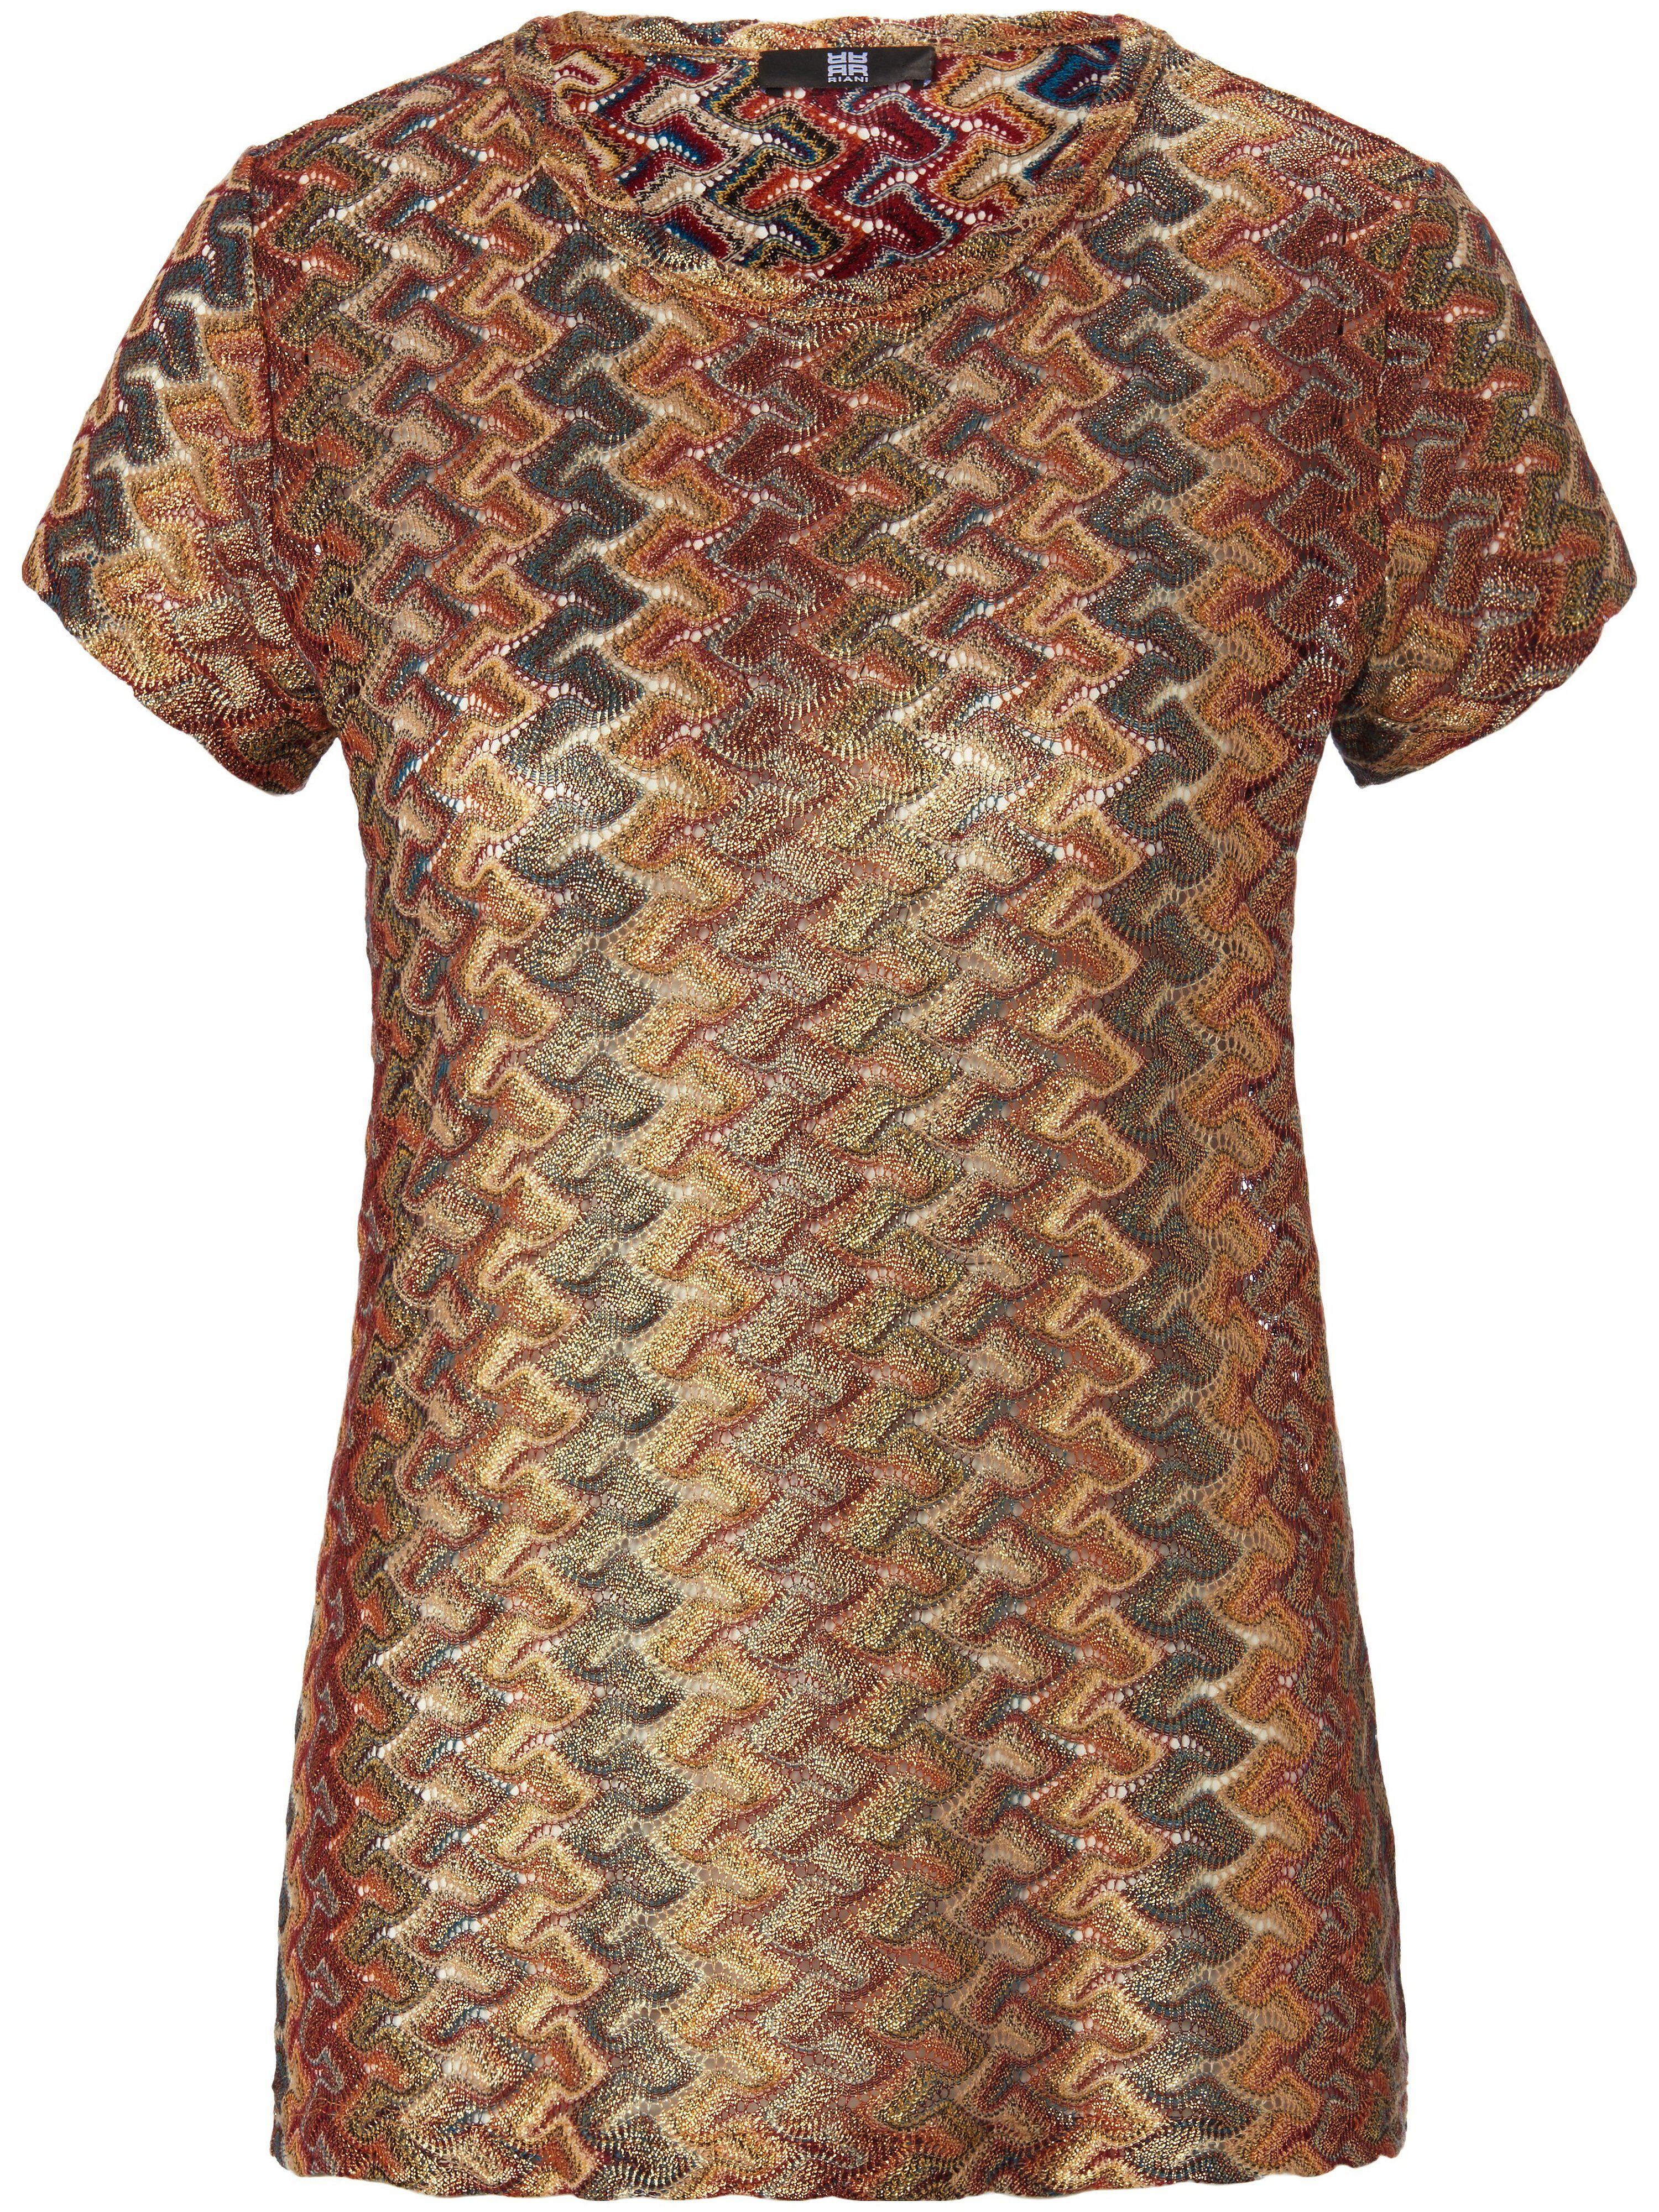 Riani Le T-shirt encolure ras-de-cou  Riani couleur or  - Femme - 38